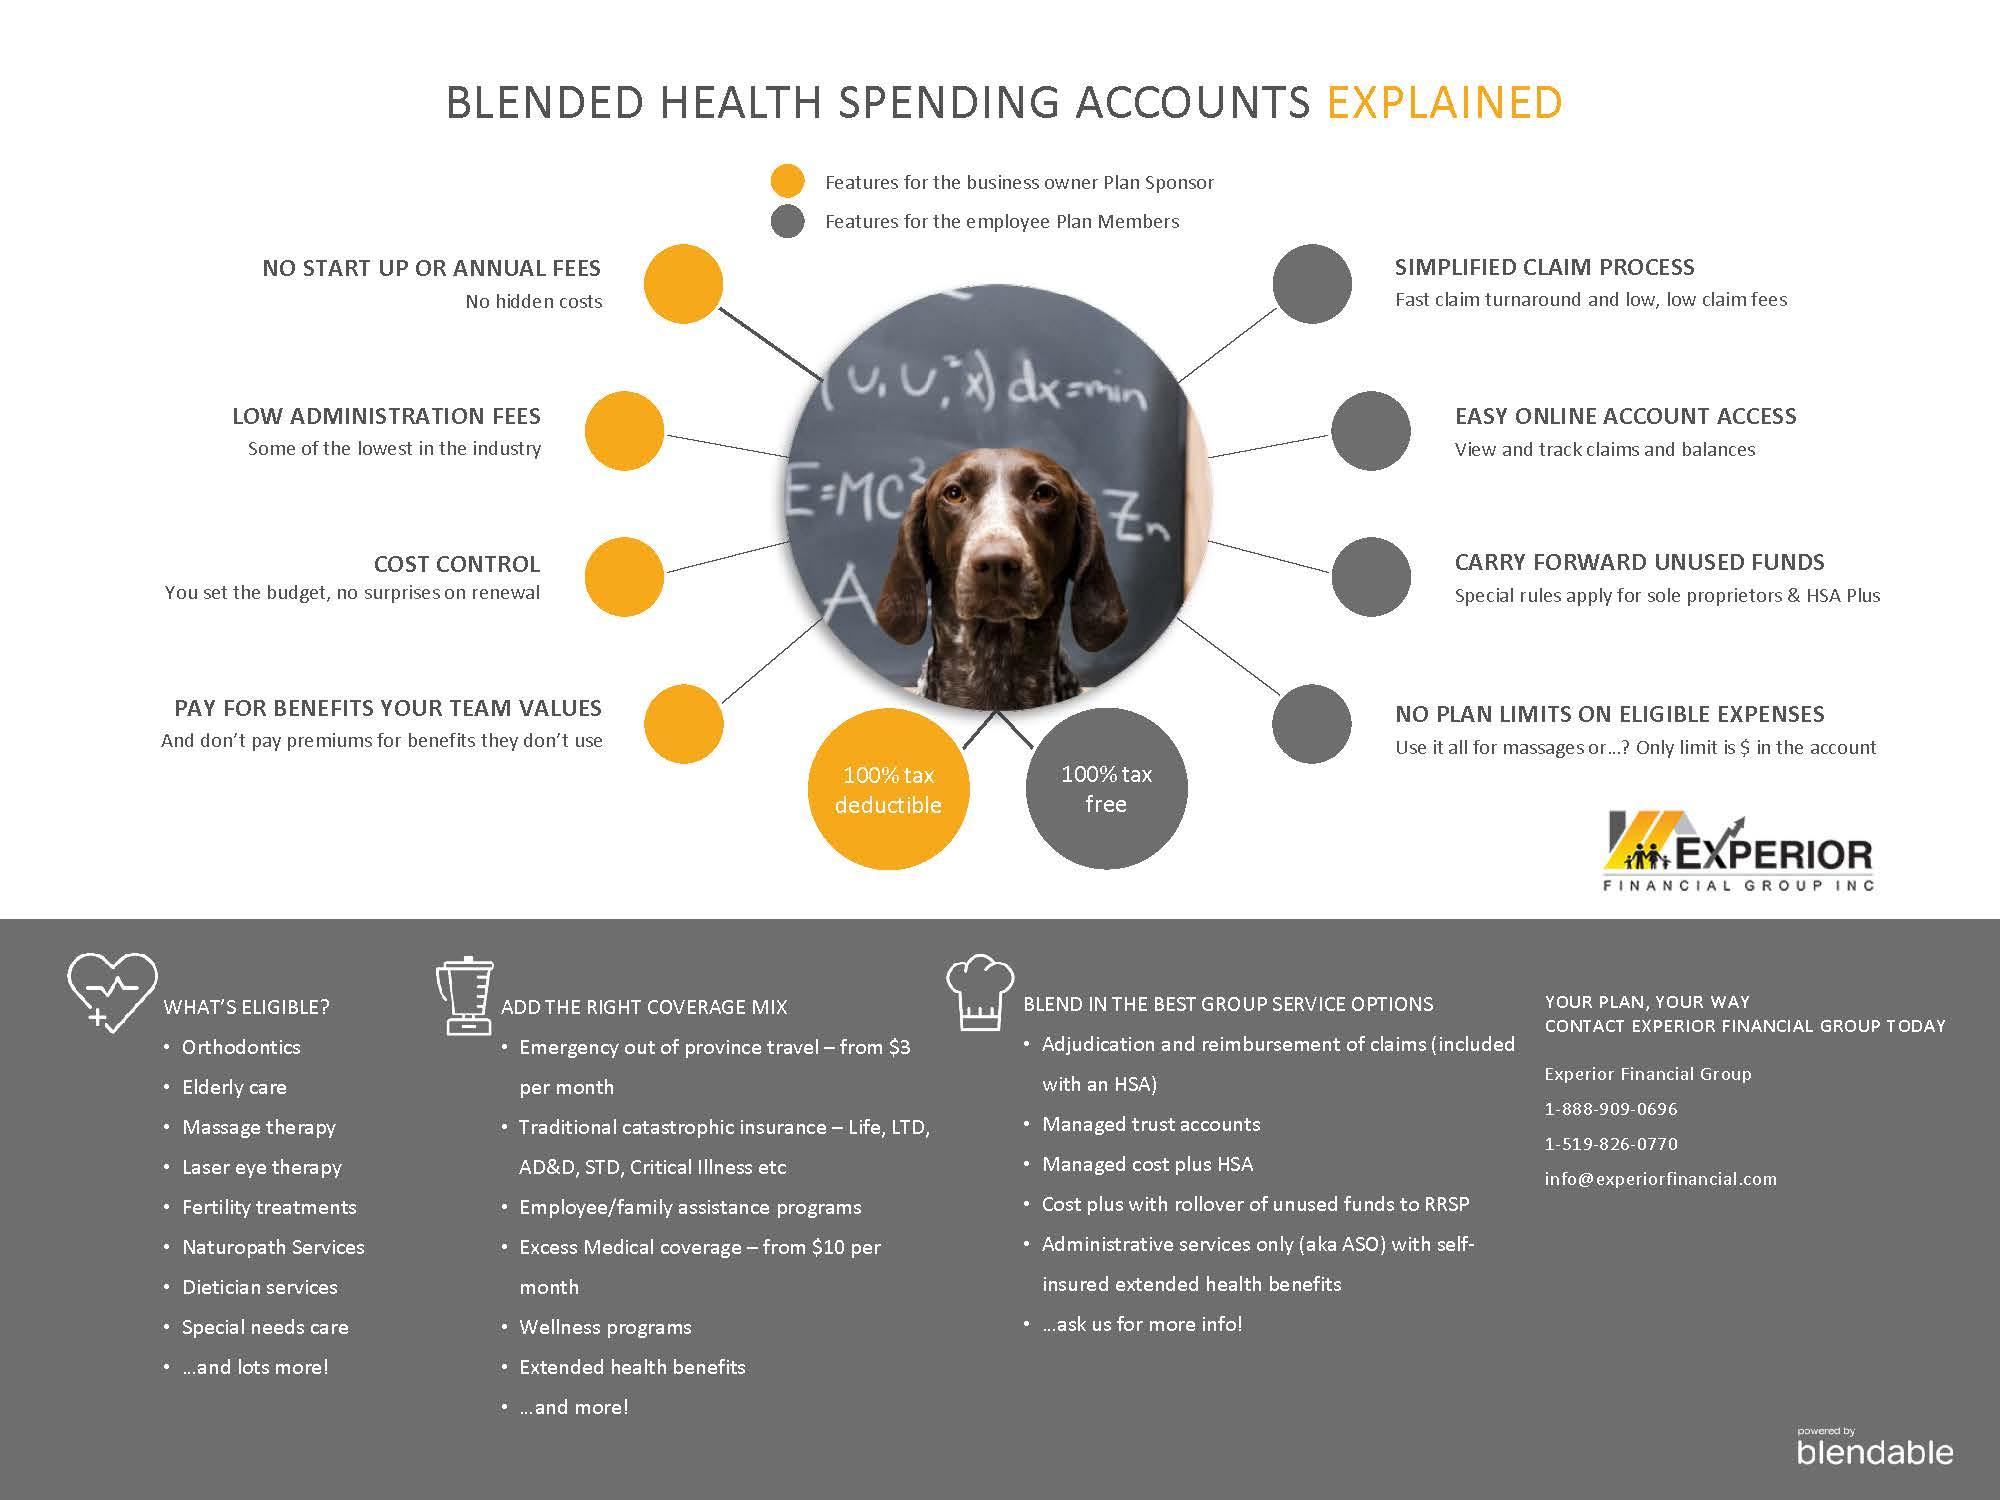 Exceptional Benefits Of Having Health Spending Account